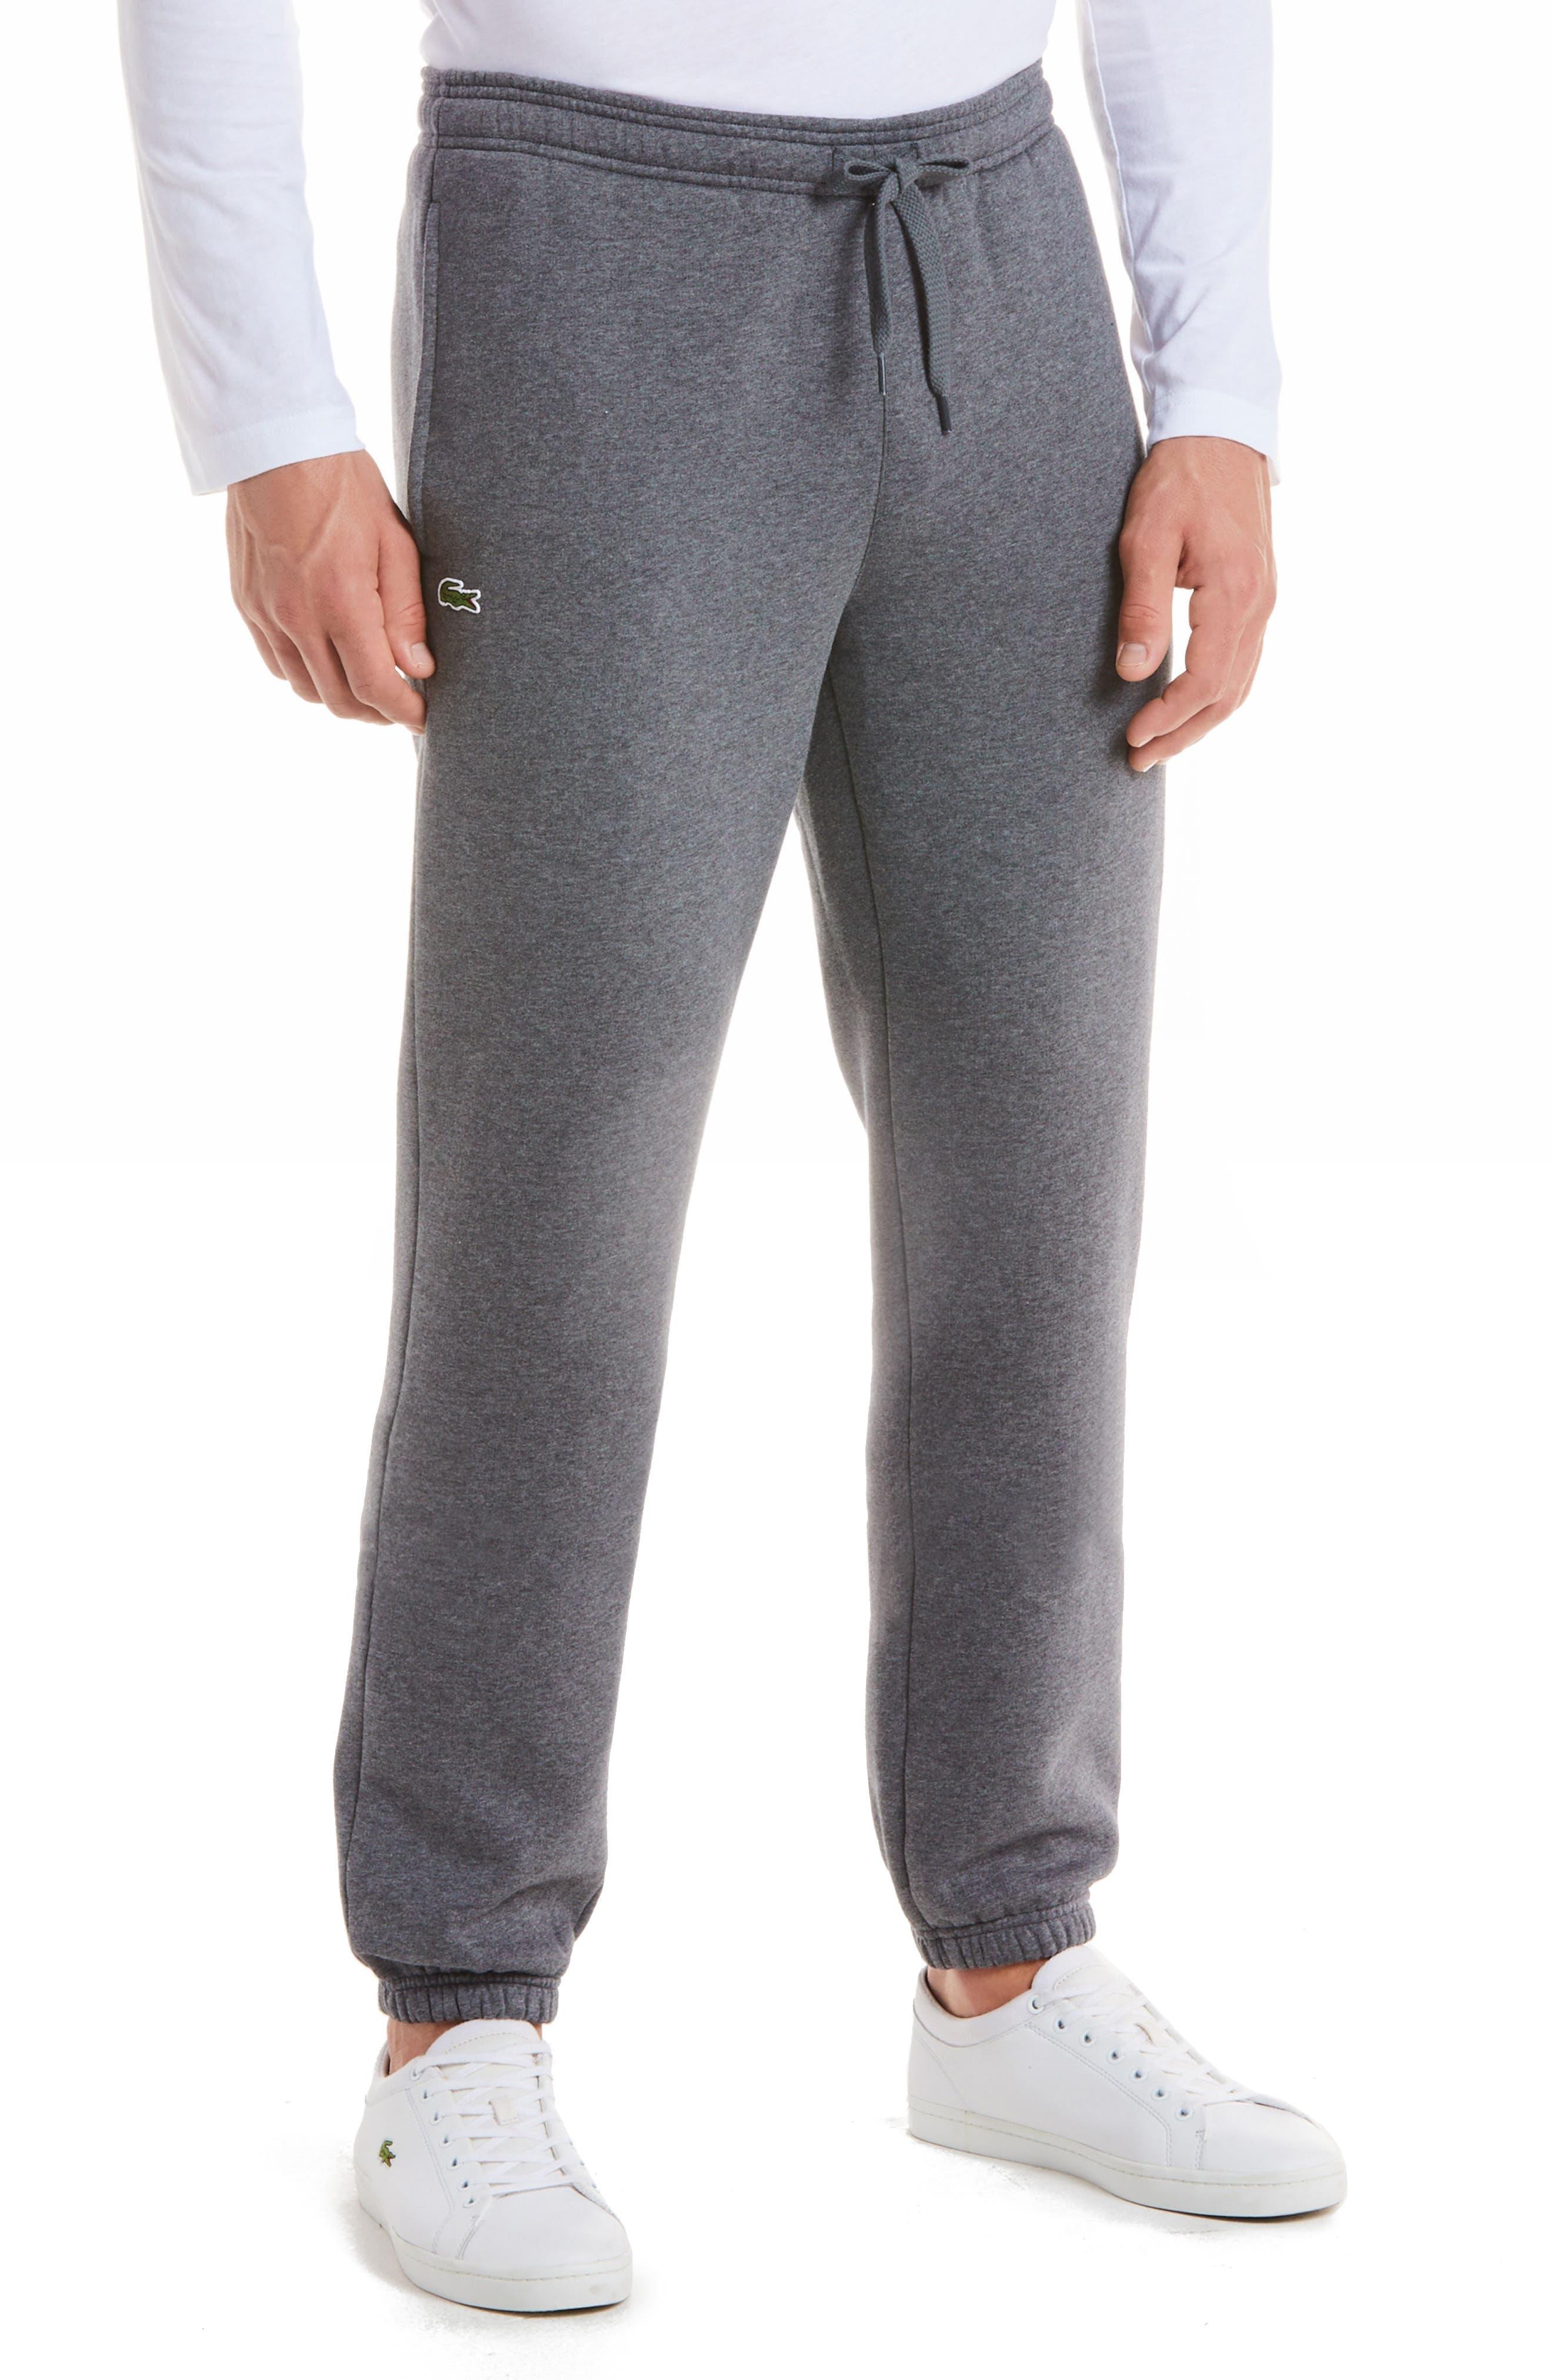 Men's Lacoste 'Sport' Tapered Sweatpants